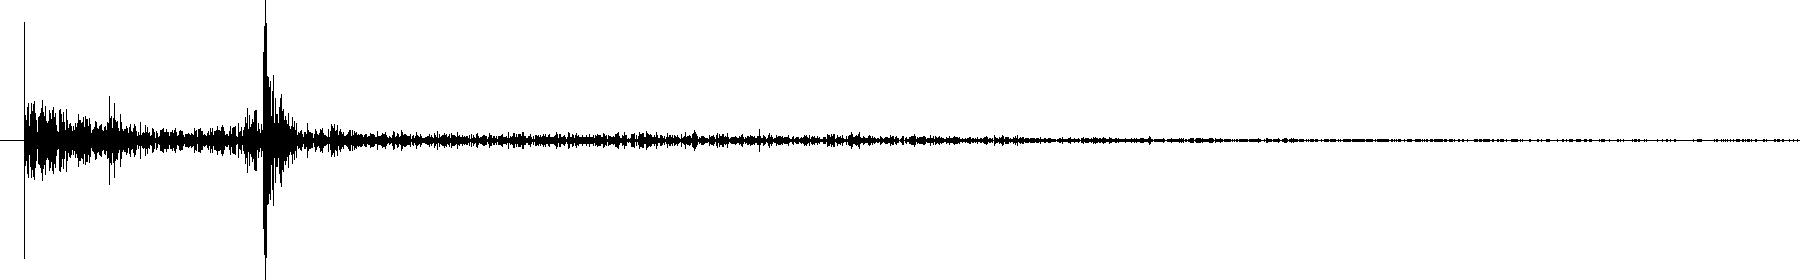 perc 1 7